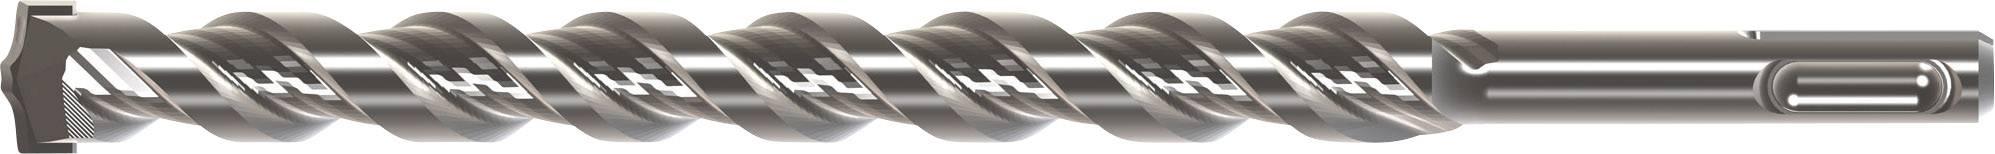 Tvrdý kov kladivový vrták Heller 156202, 5 mm, 110 mm, 1 ks